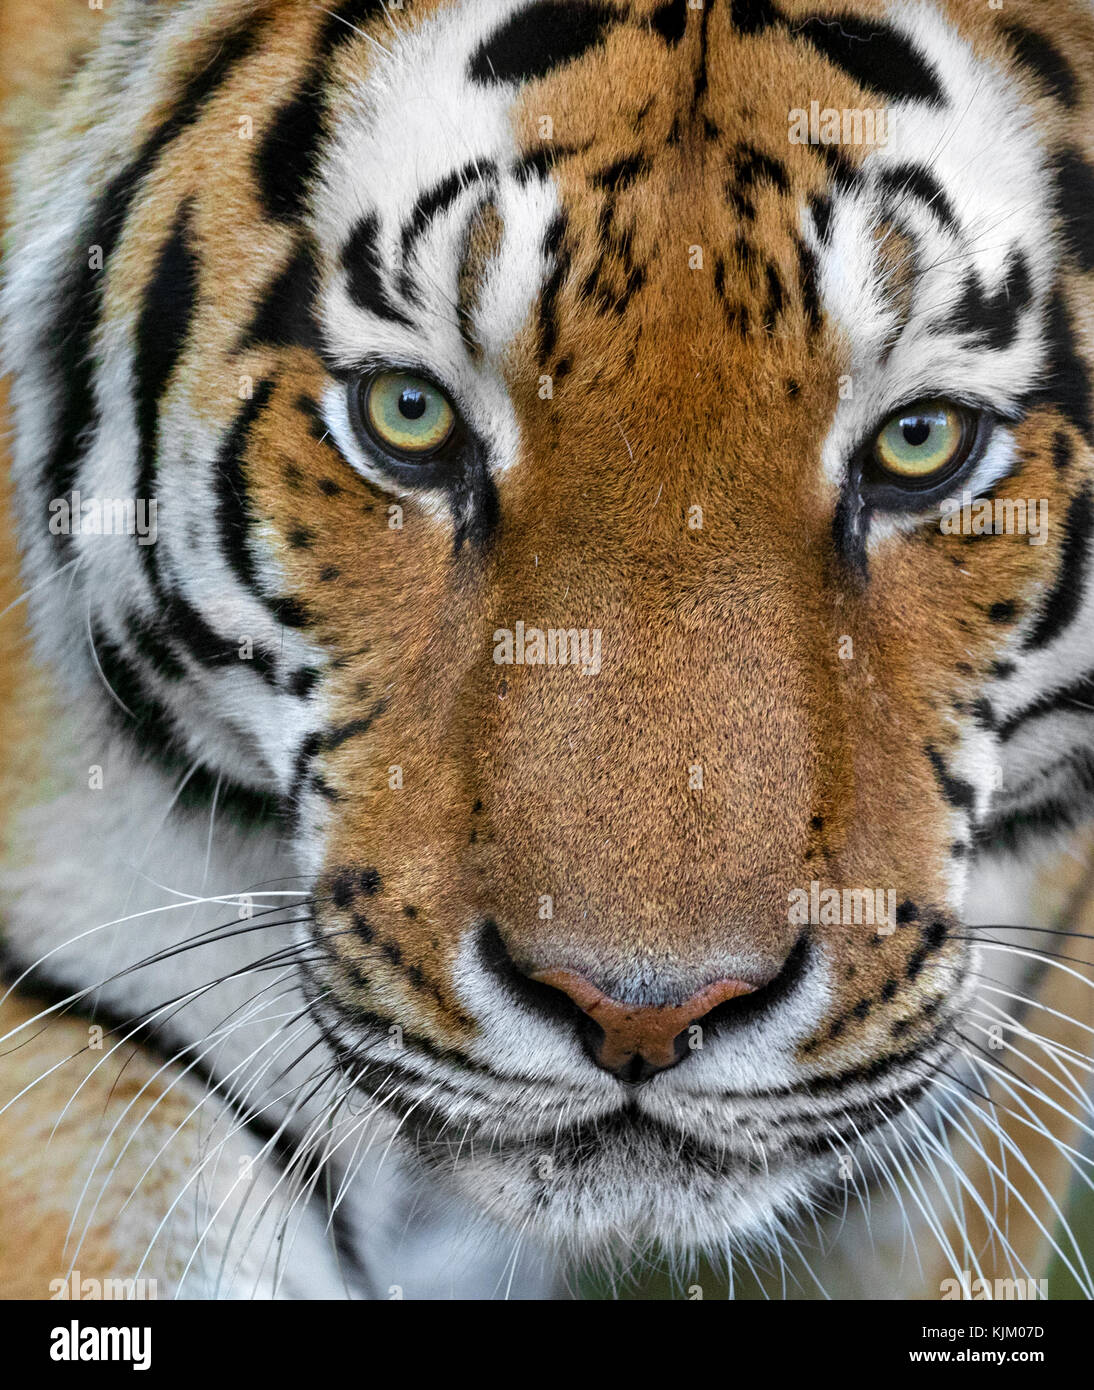 Portrait of an Amur tiger - Stock Image